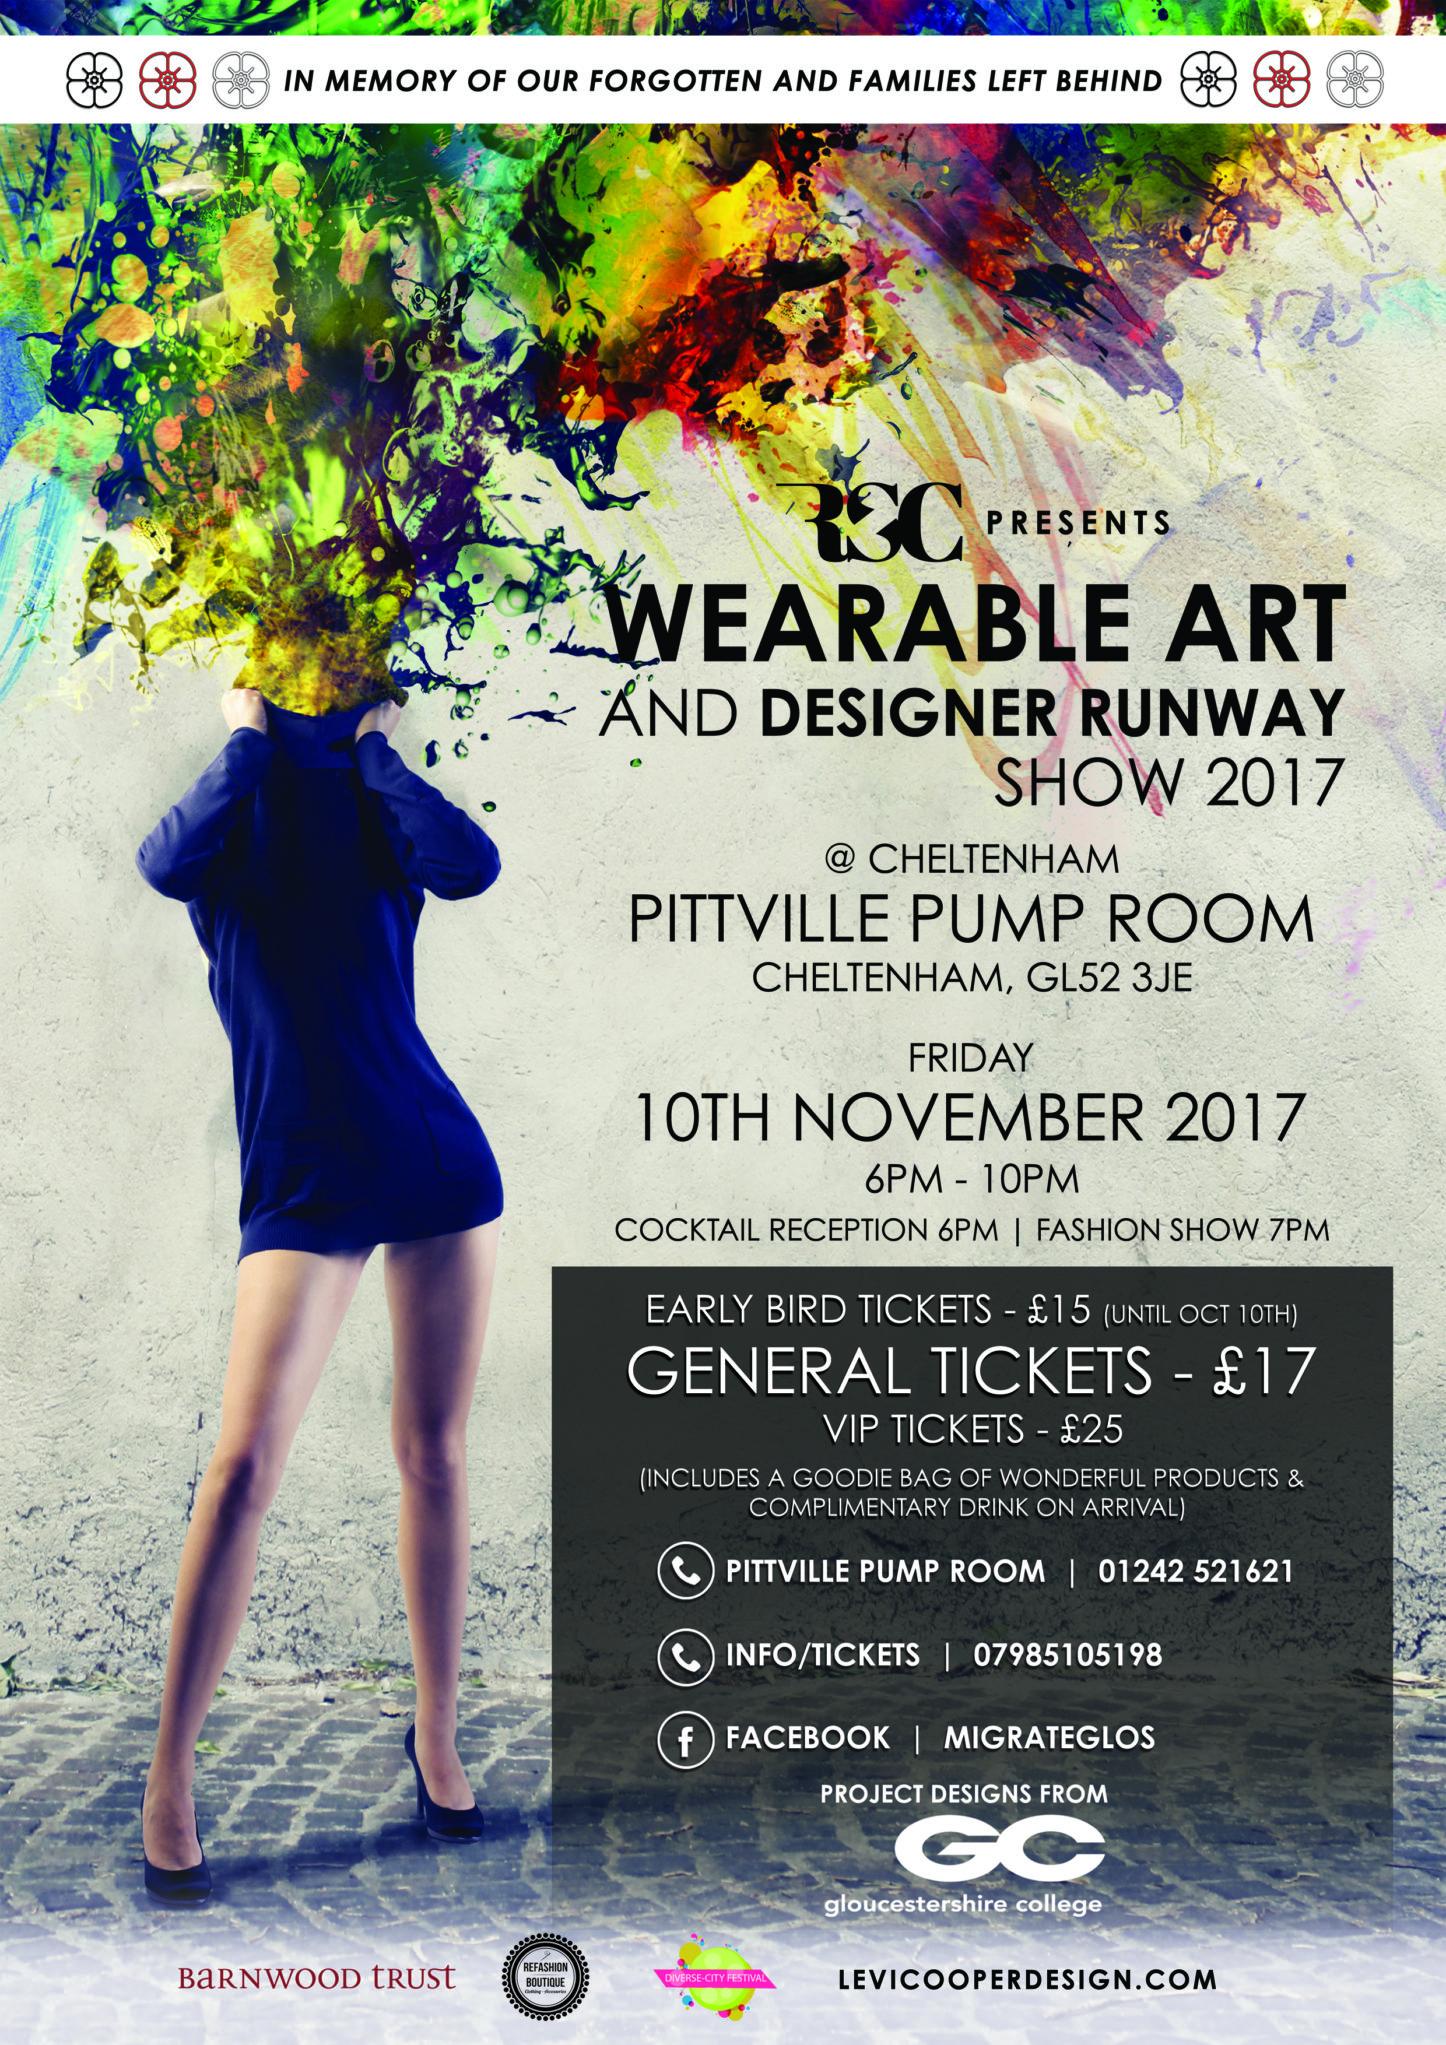 Wearable Art and runway show 2017 | Blacknet UK